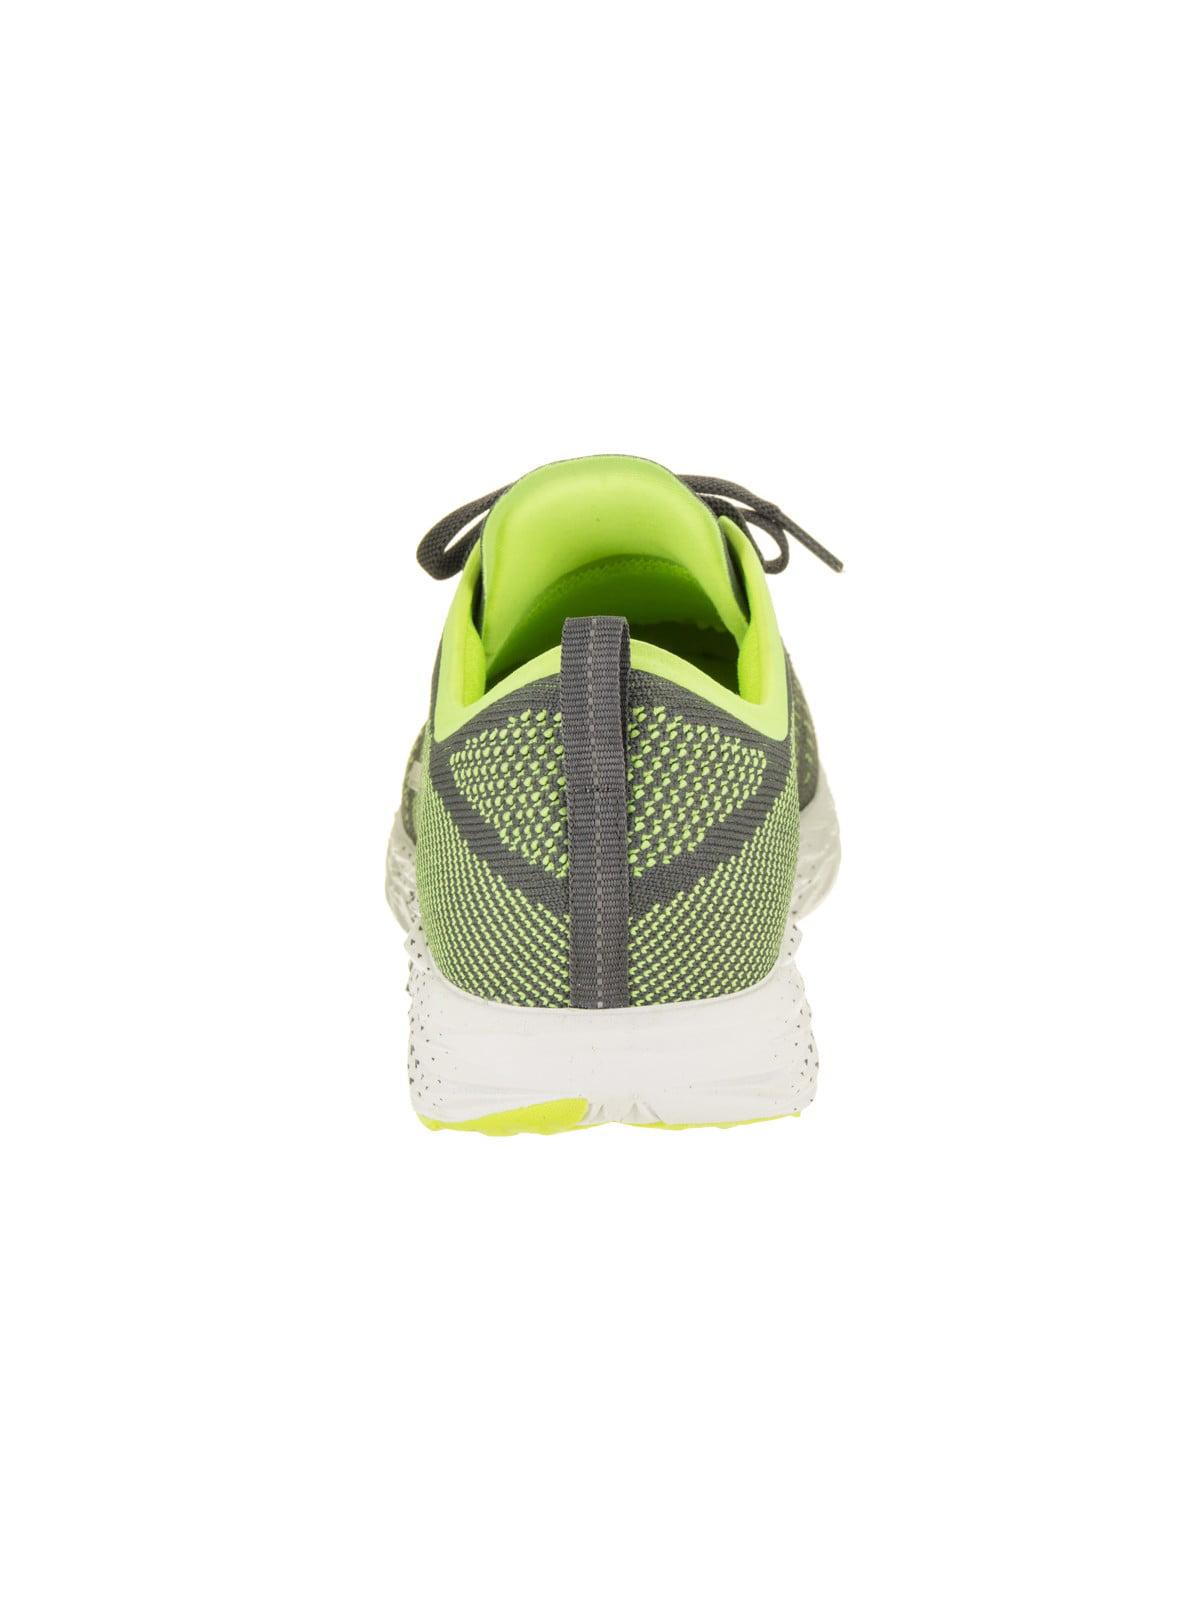 Skechers Men's Go Meb Razor 2 Running Shoe